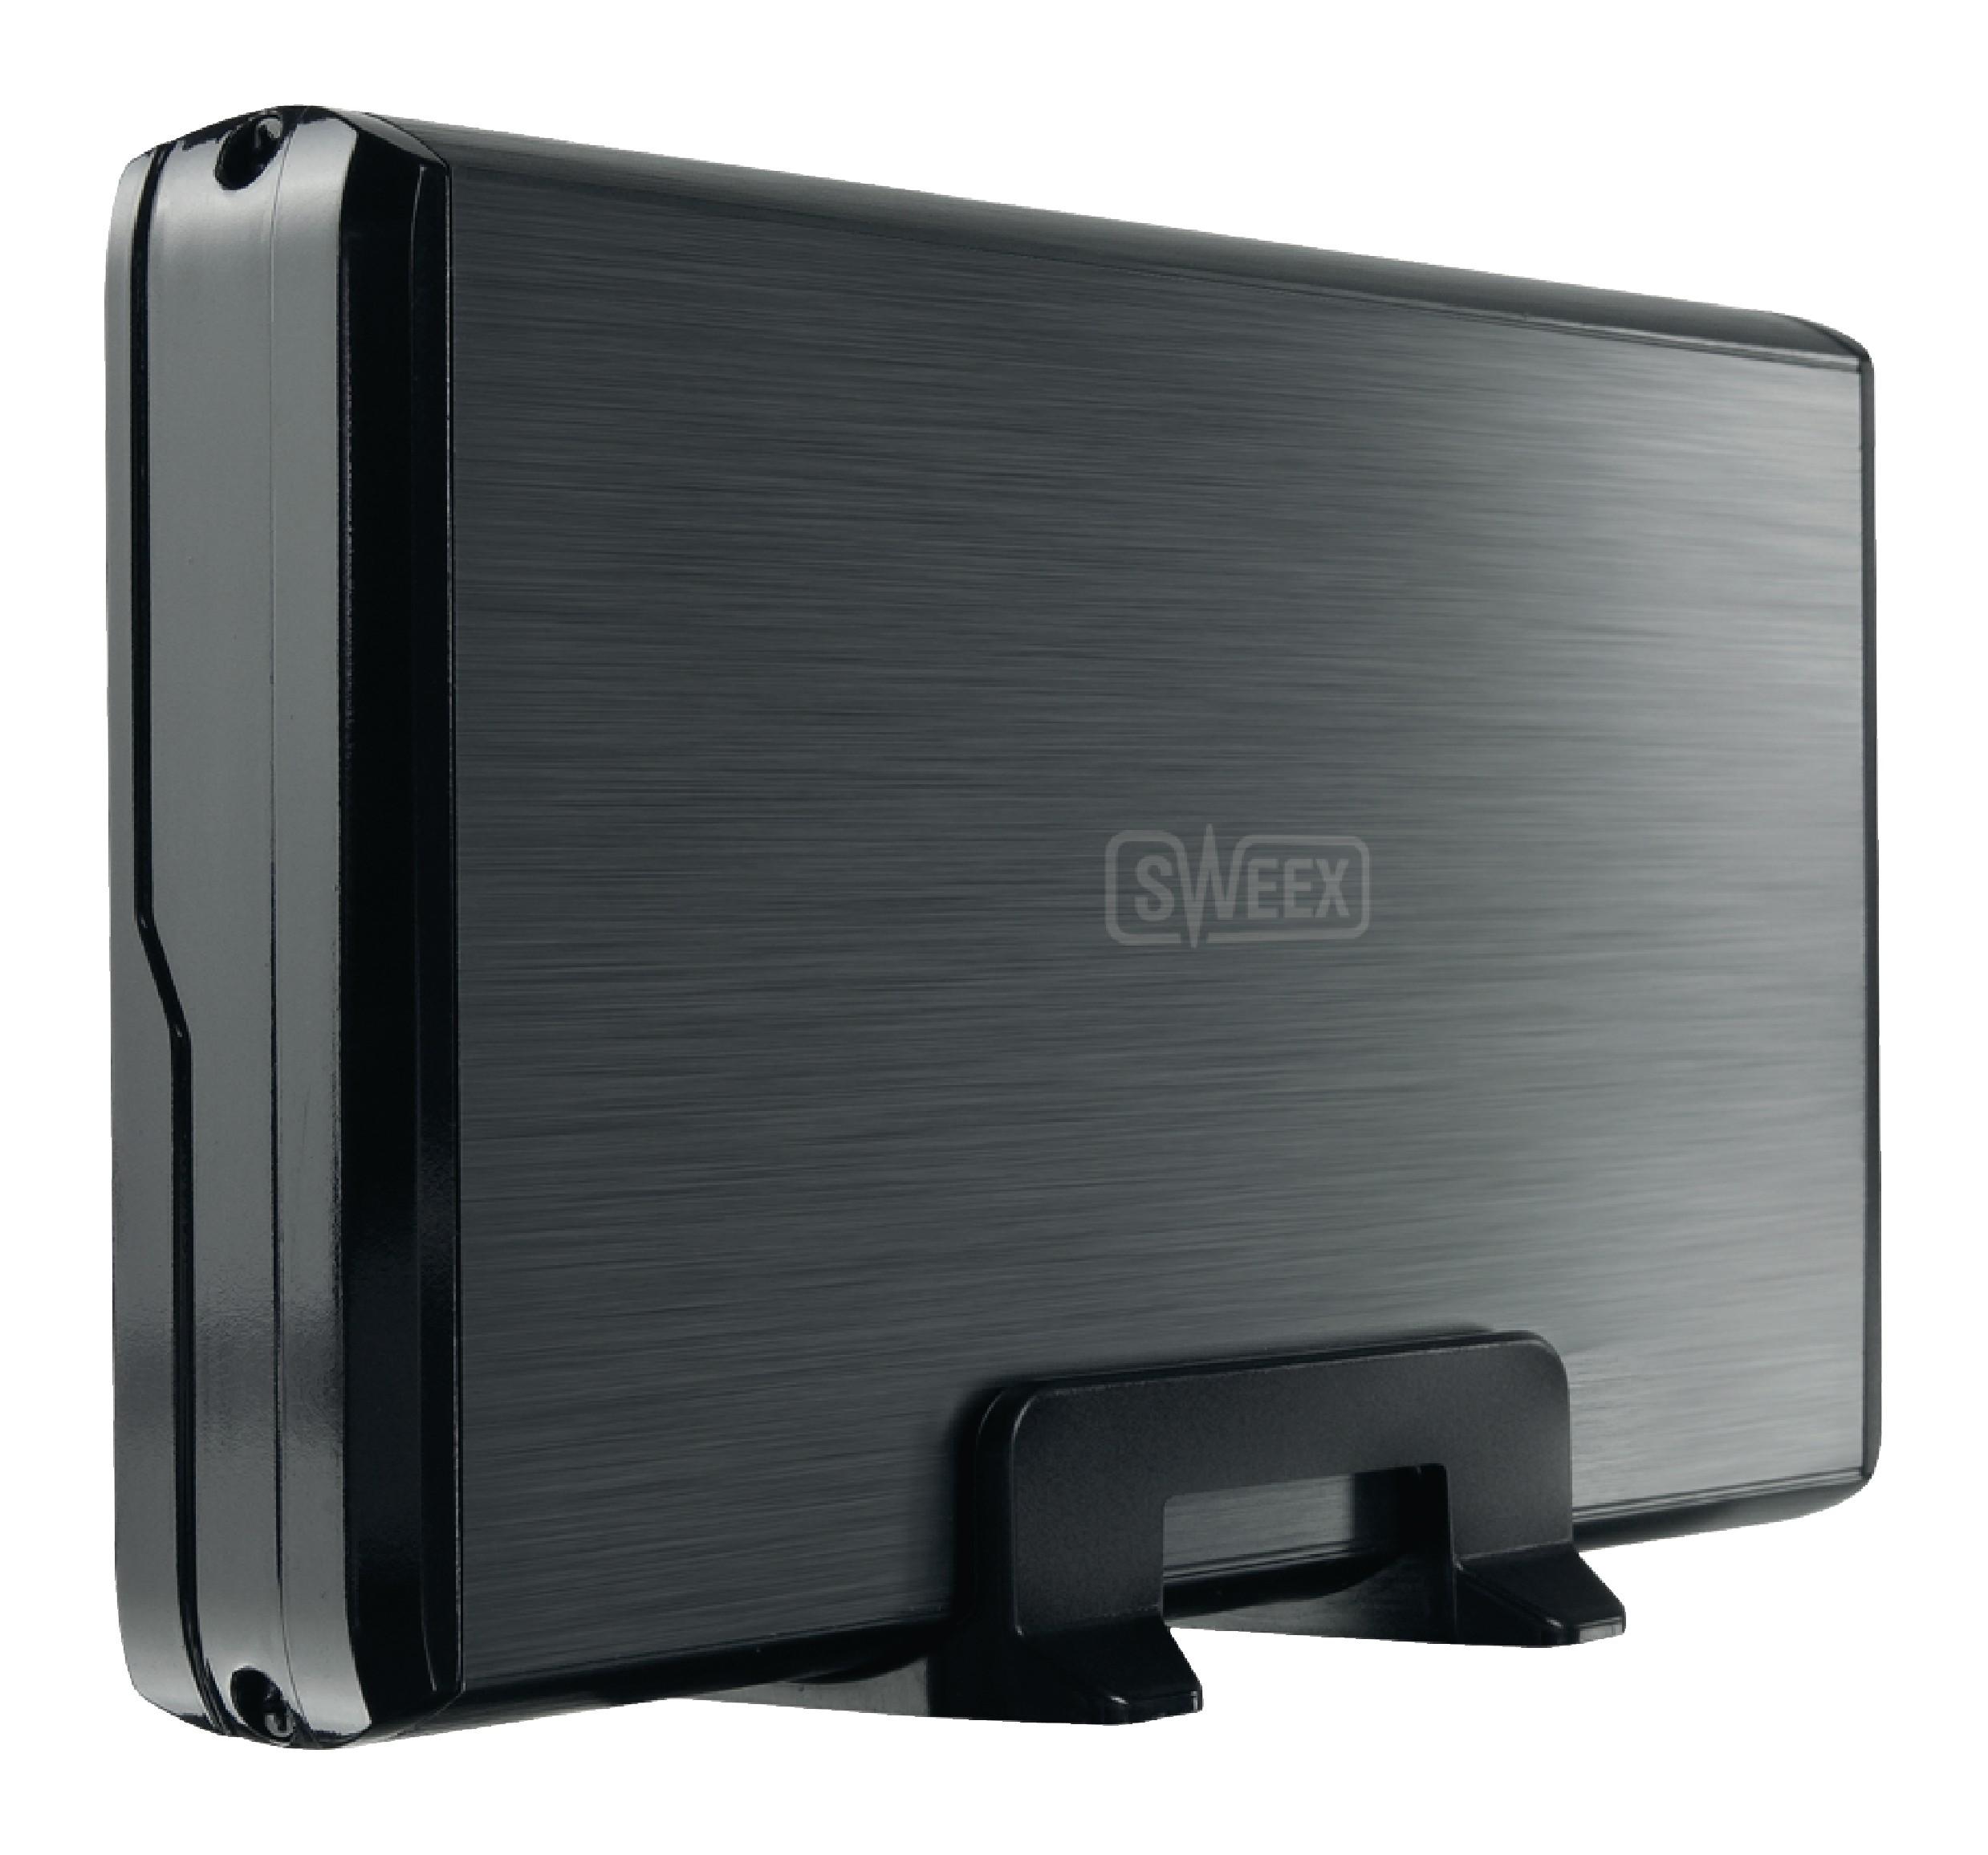 "Externí box Sweex pro pevný disk 3.5"" SATA USB 2.0, ST032"